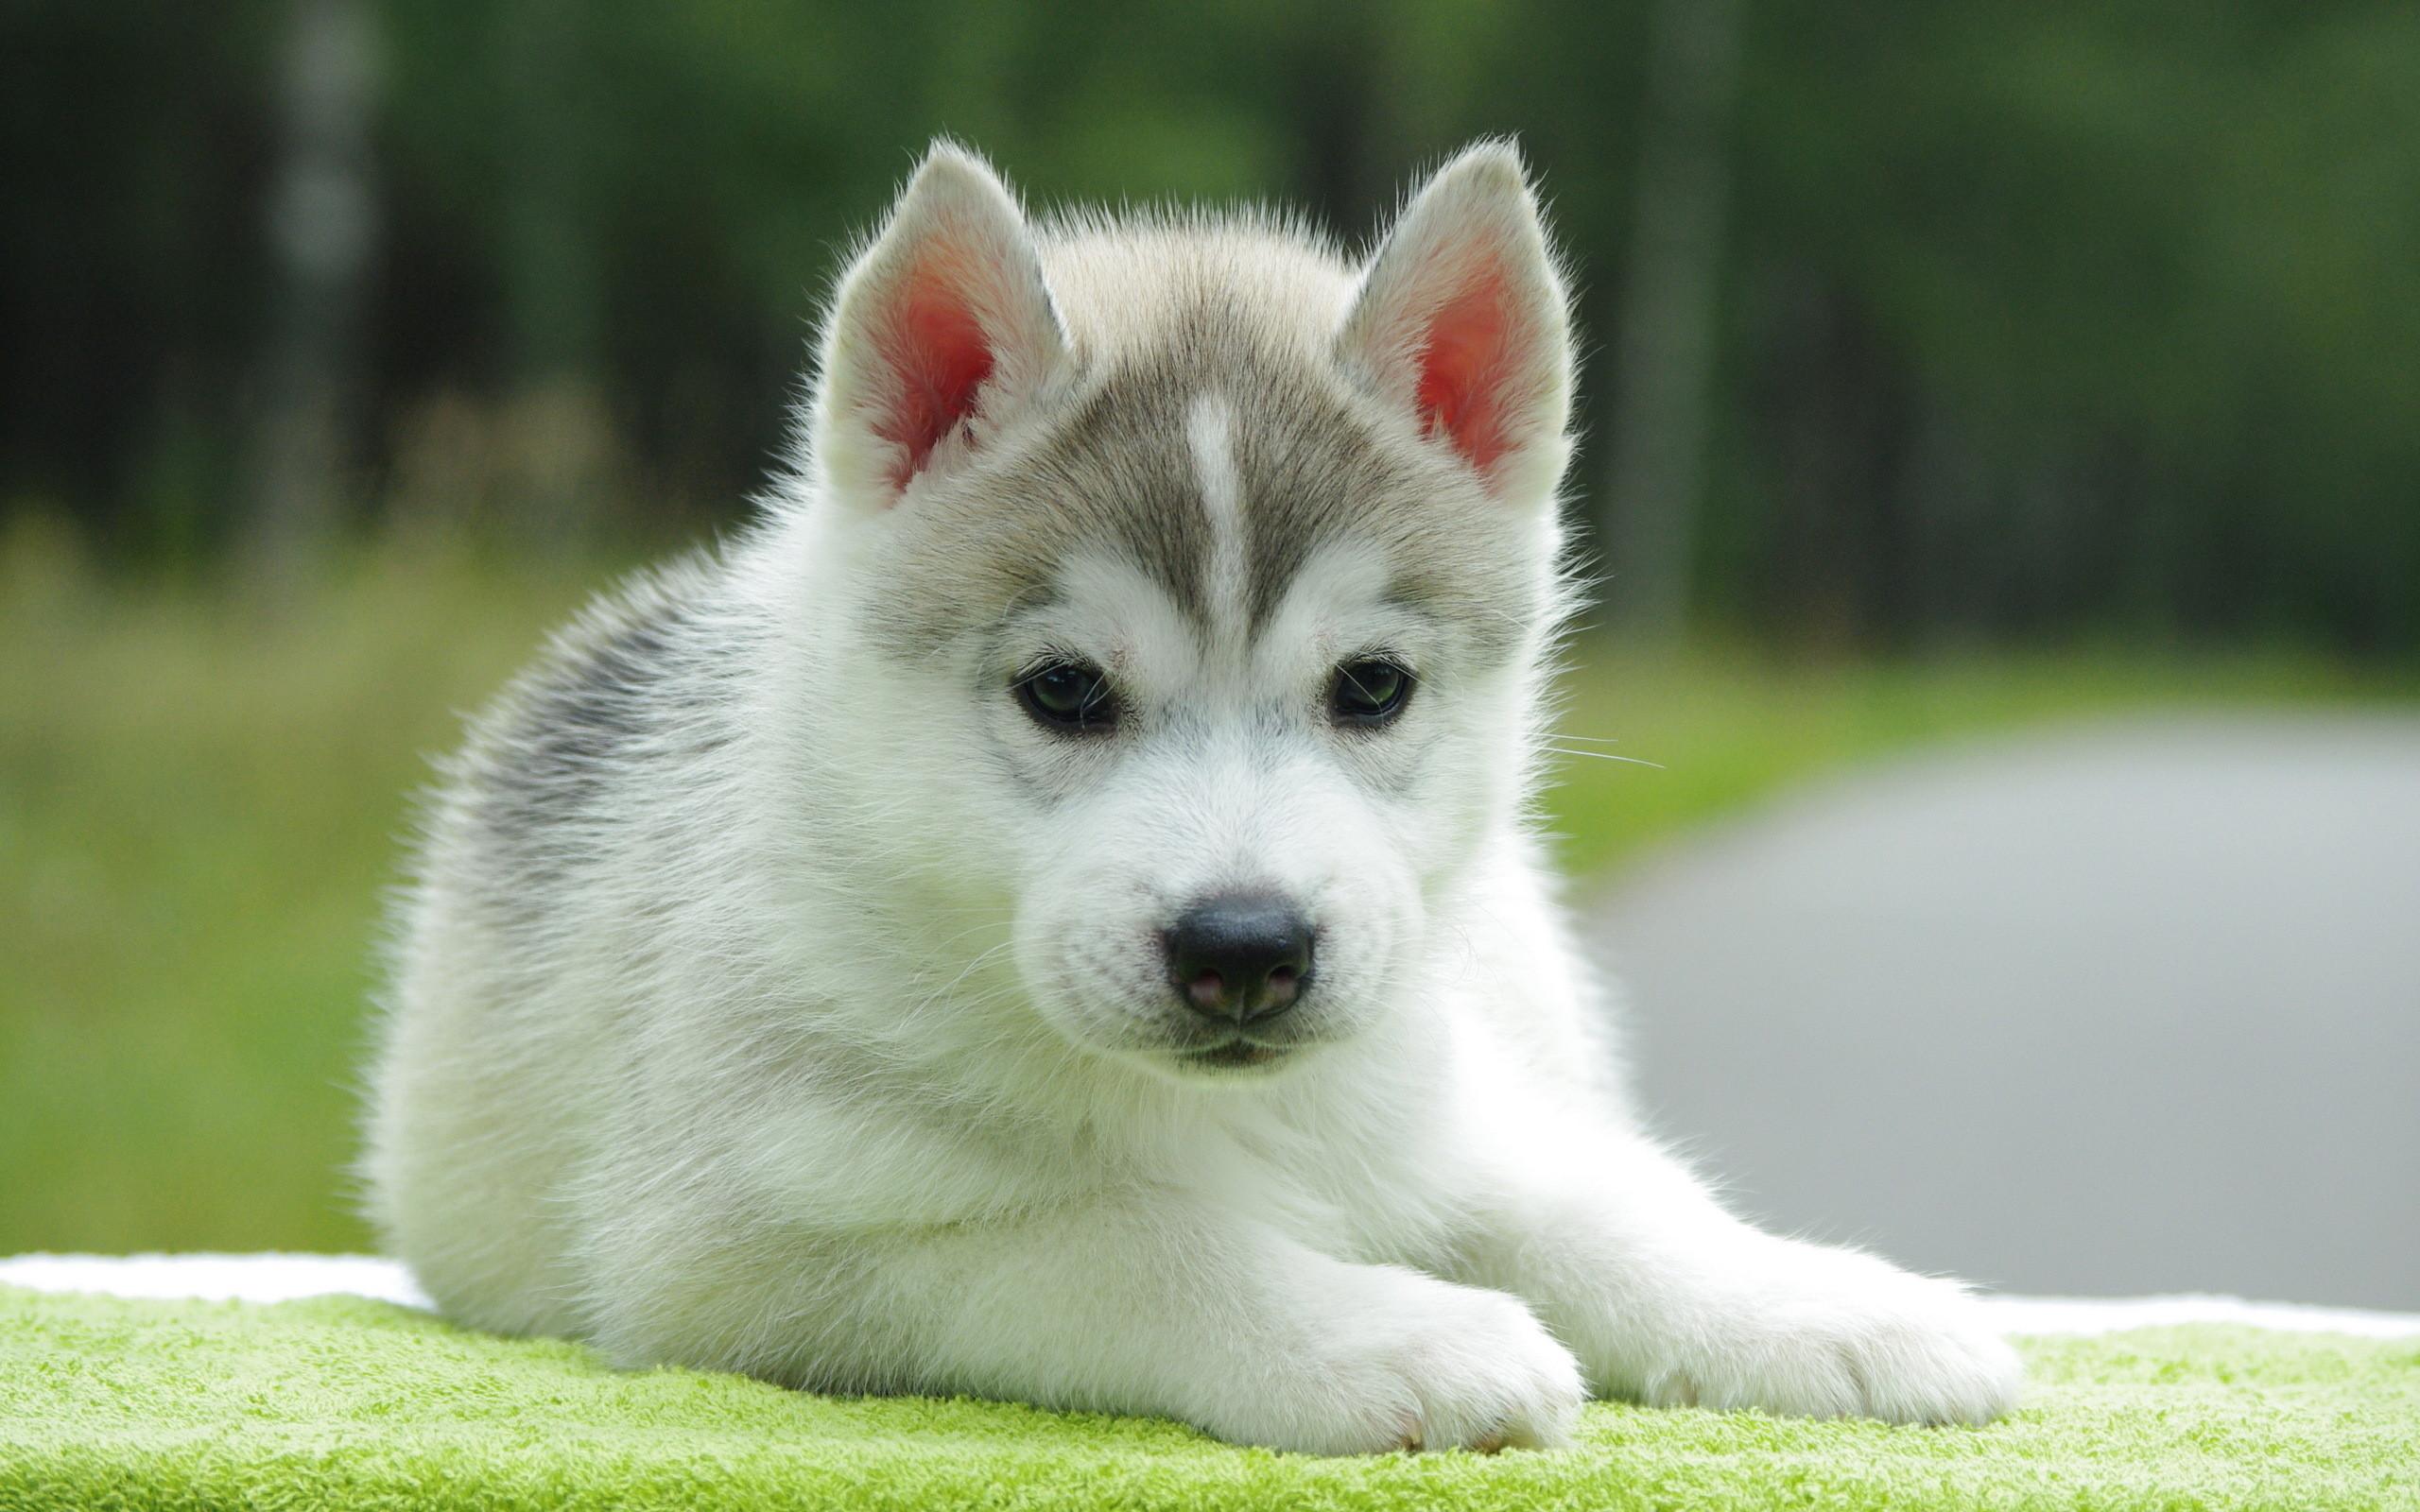 Cute puppy backgrounds for desktop